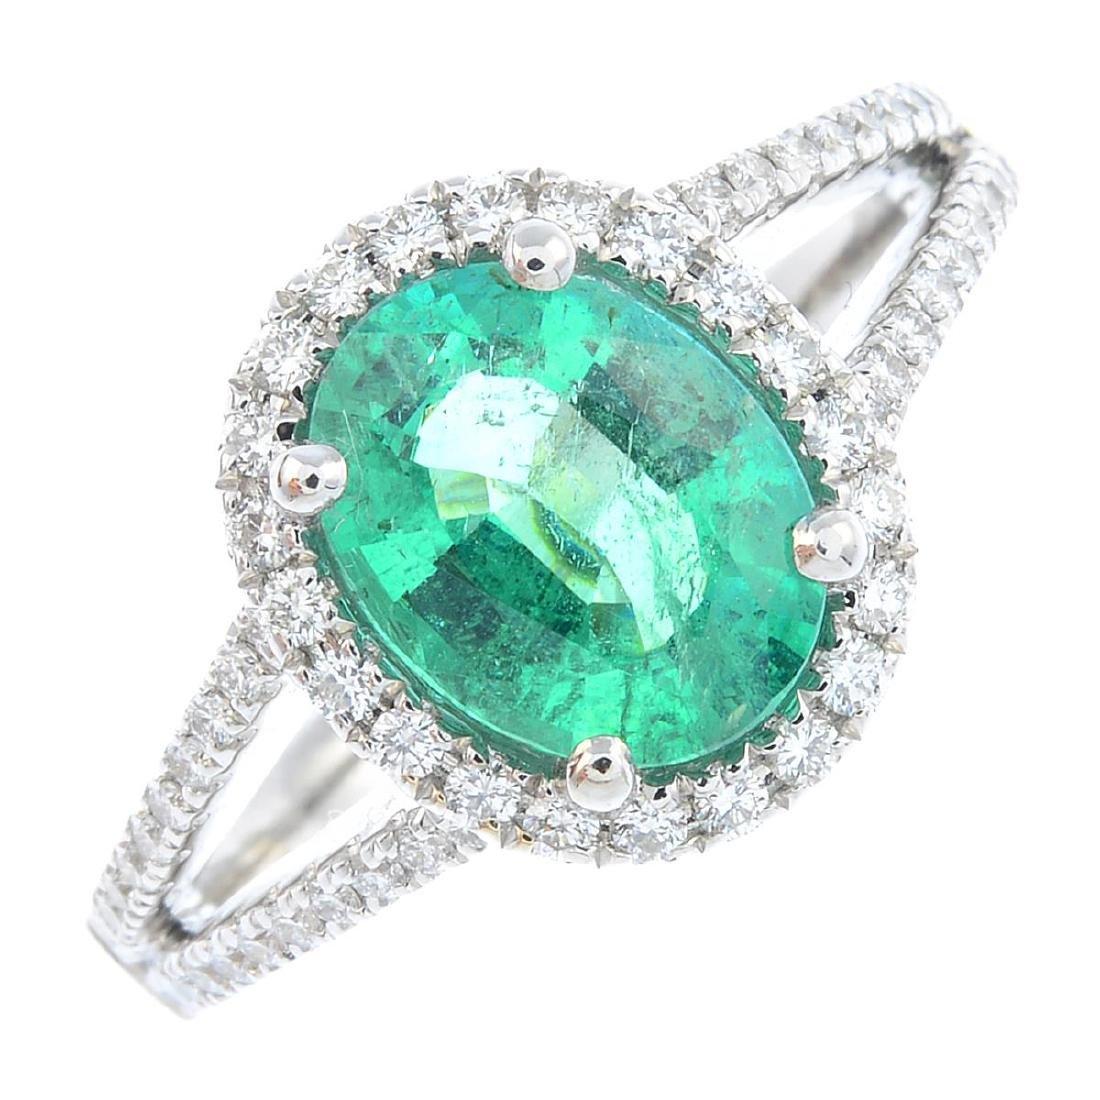 An emerald and diamond dress ring. Designed as an